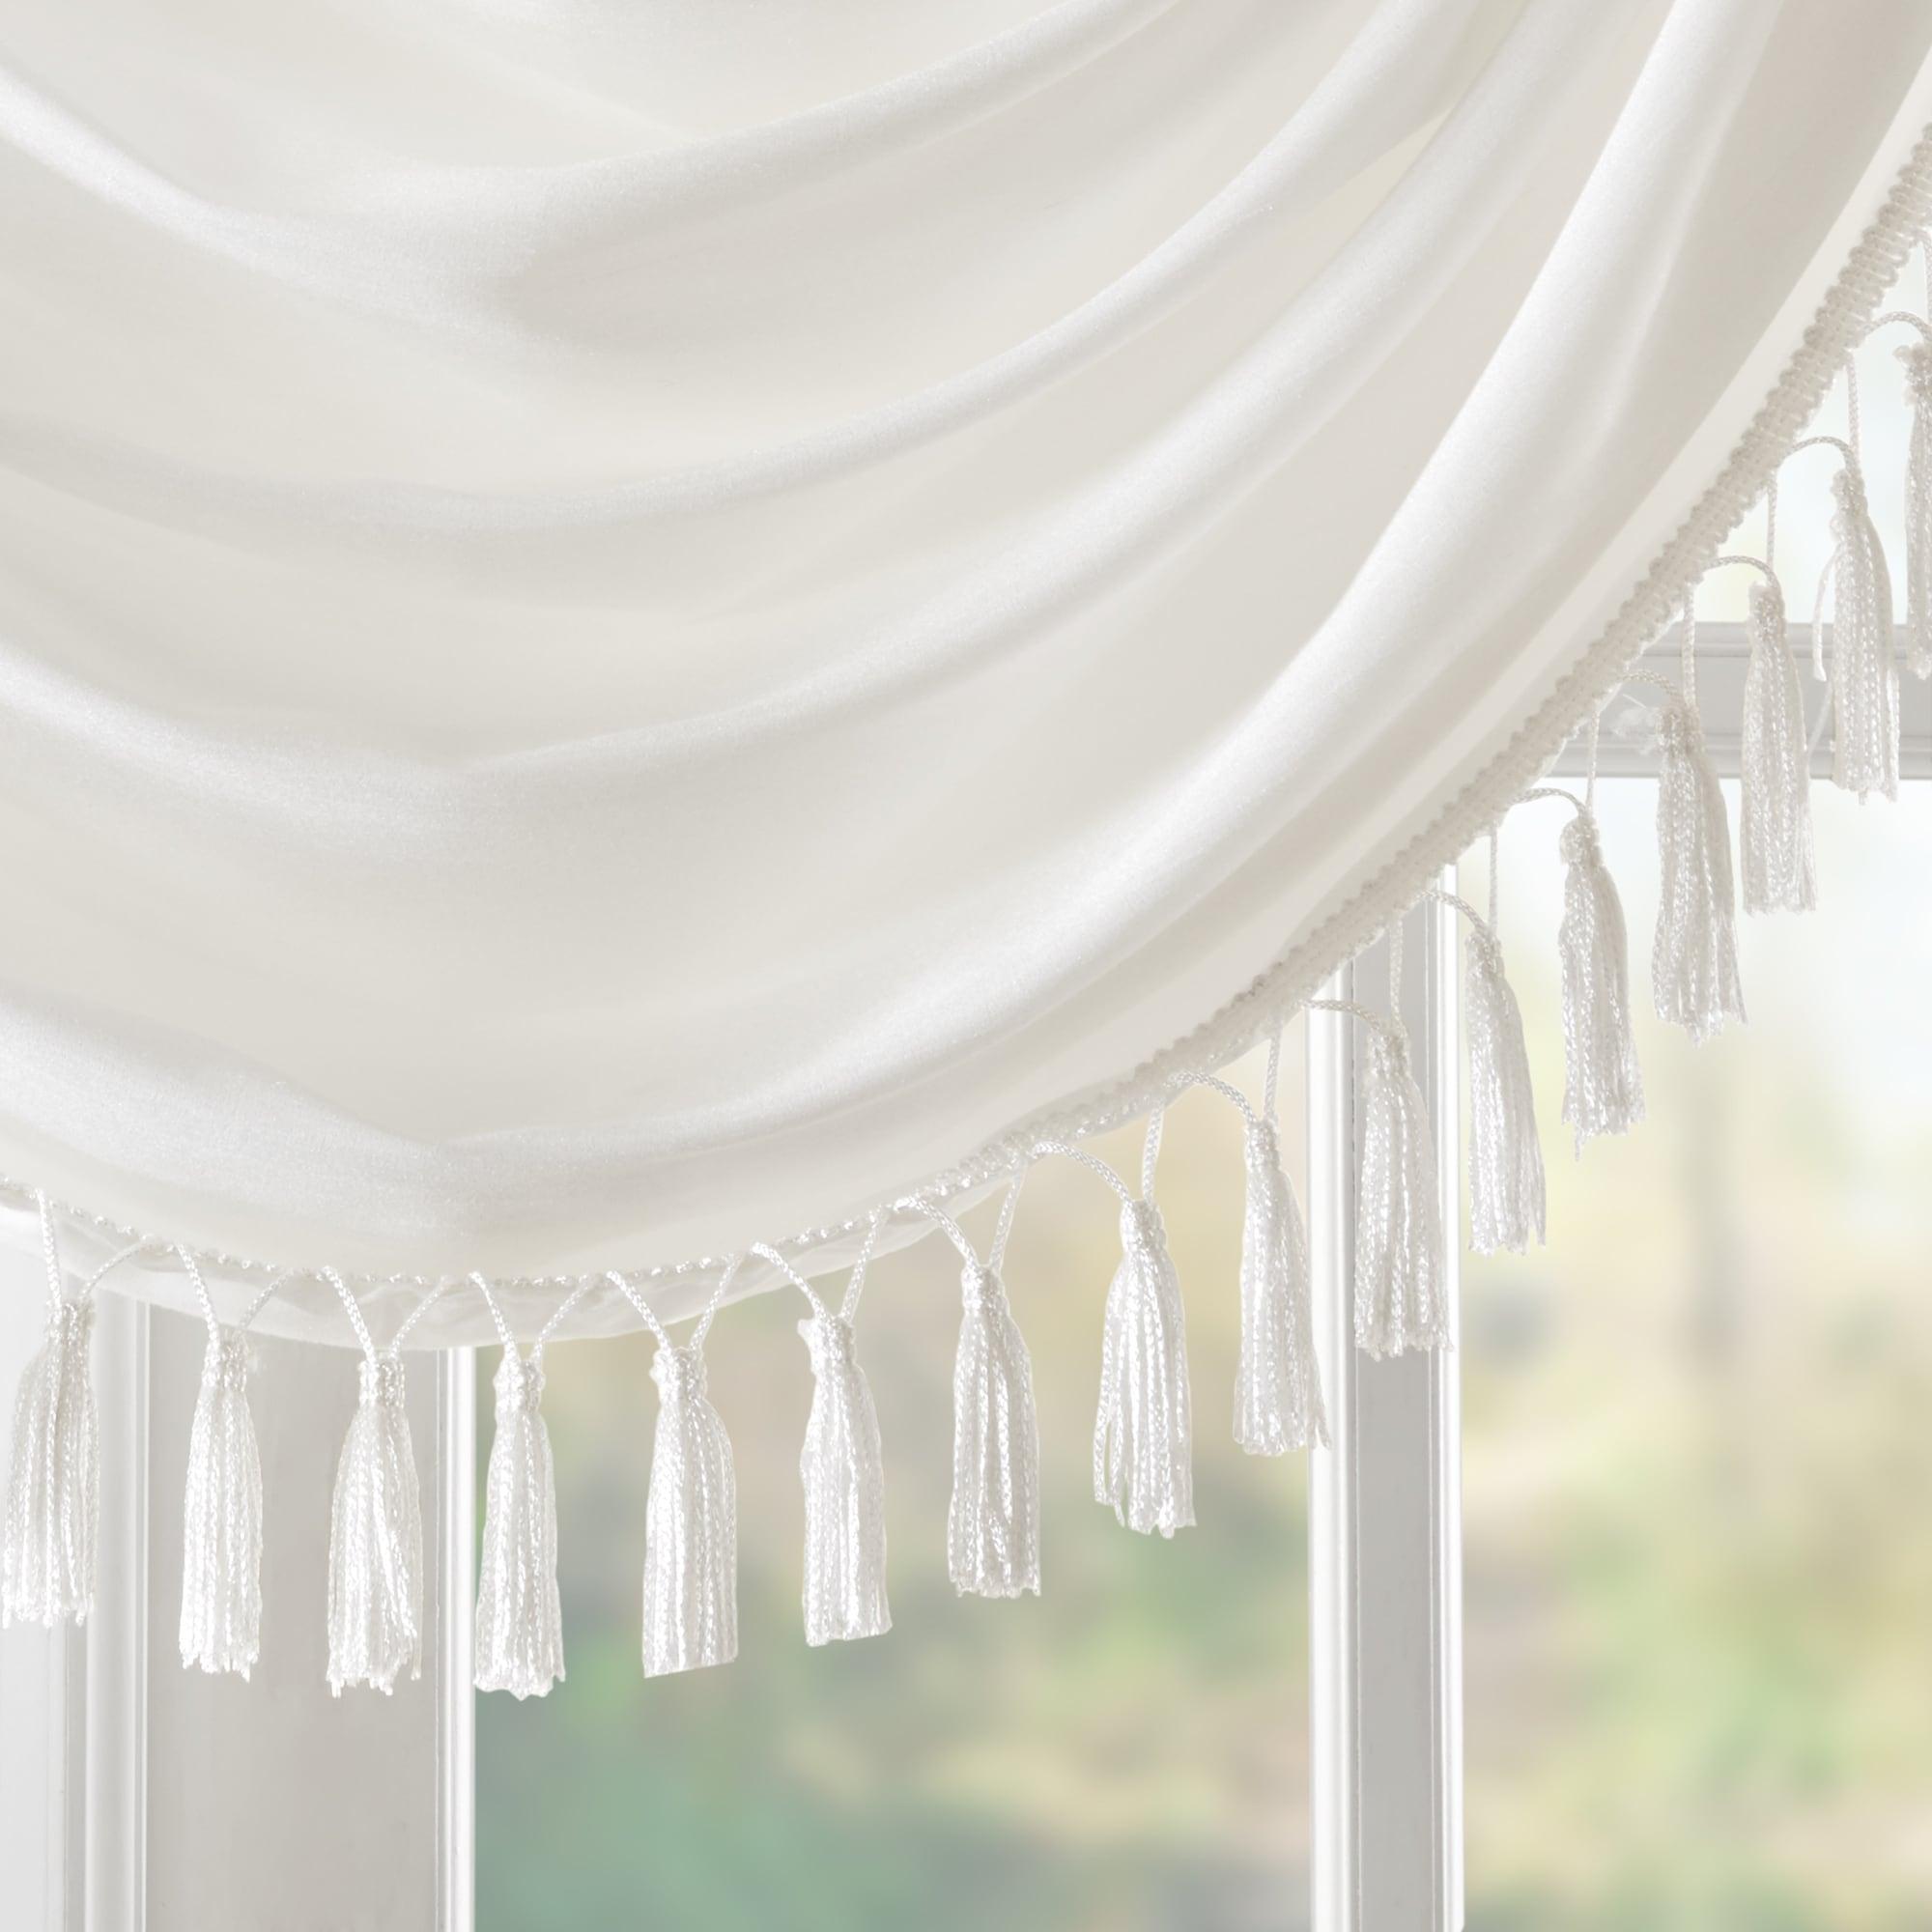 tapestry fabric x window valance valances como scalloped p lined